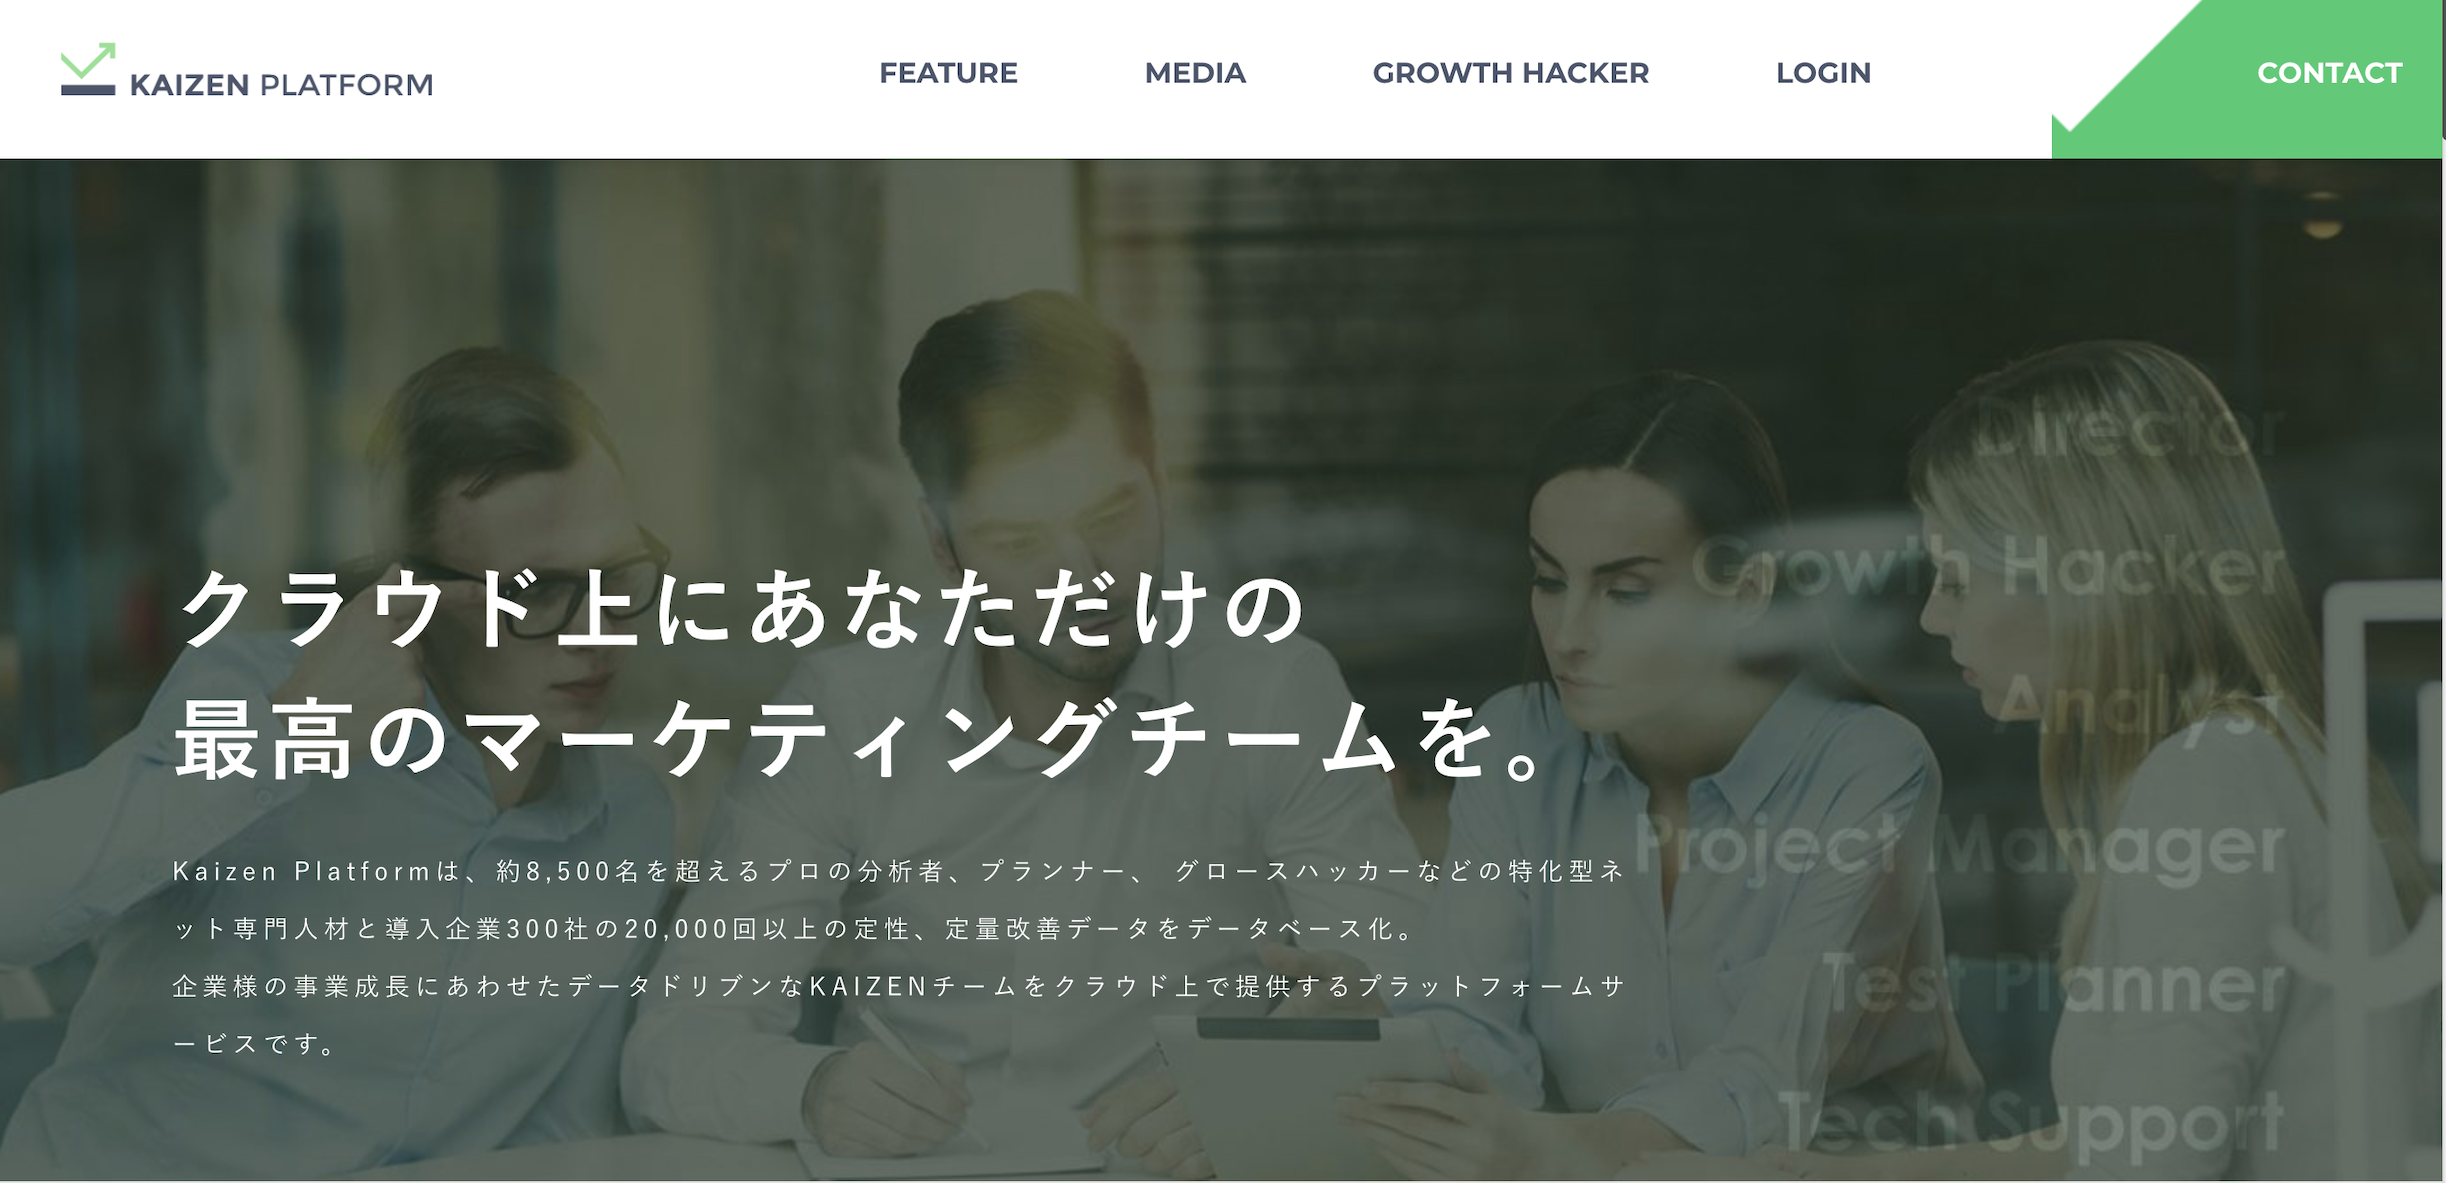 Kaizen Platformのトップページ